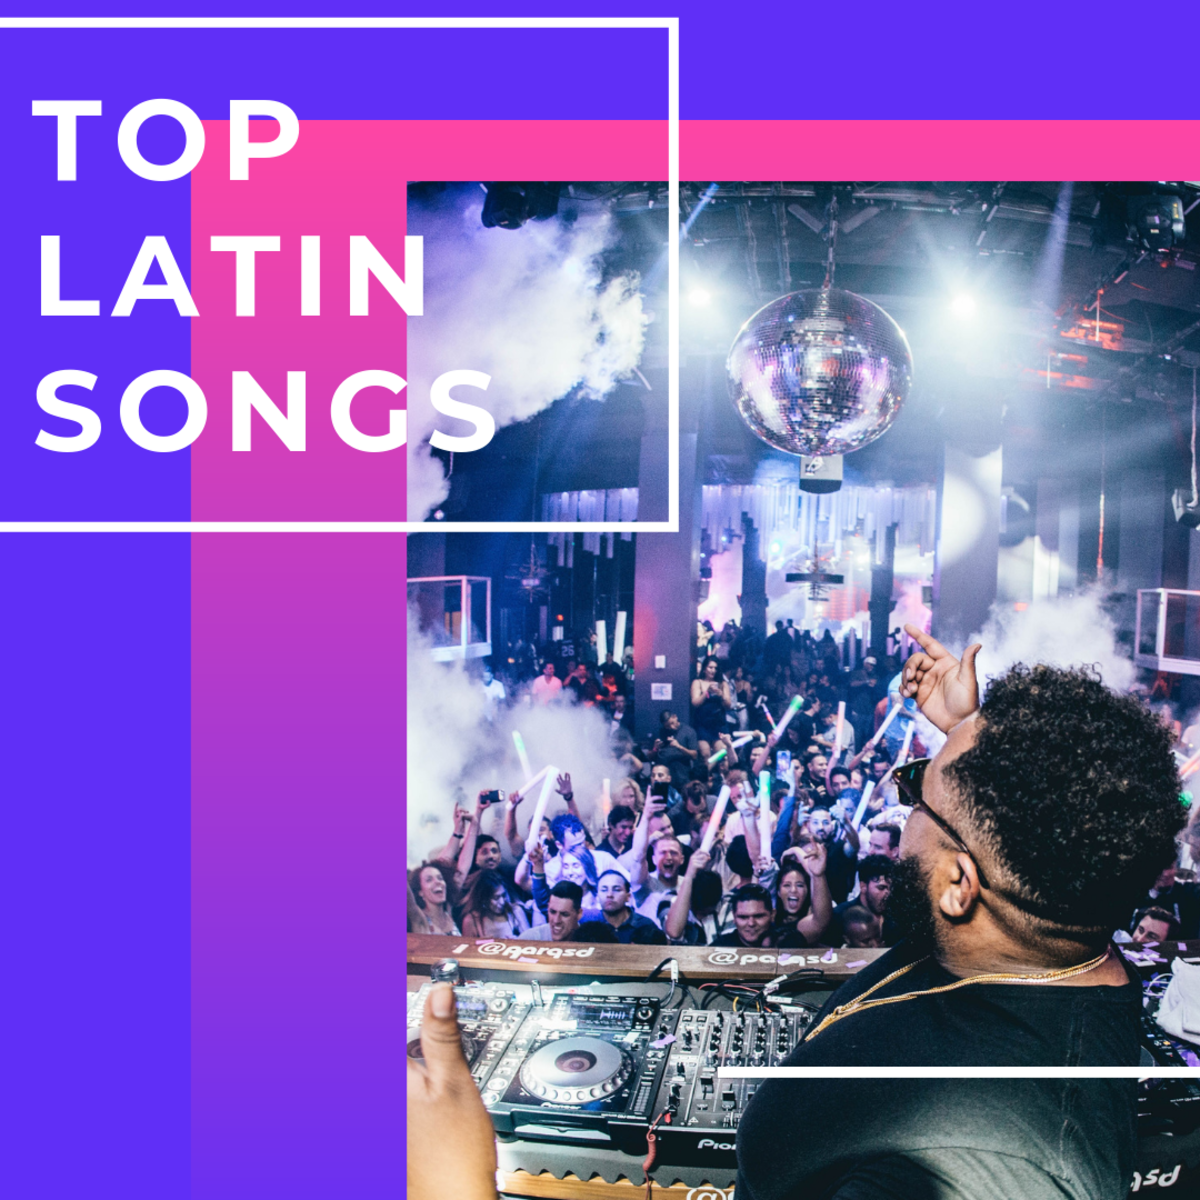 15 Hottest Spanish Songs: The Best Latin Pop Playlist